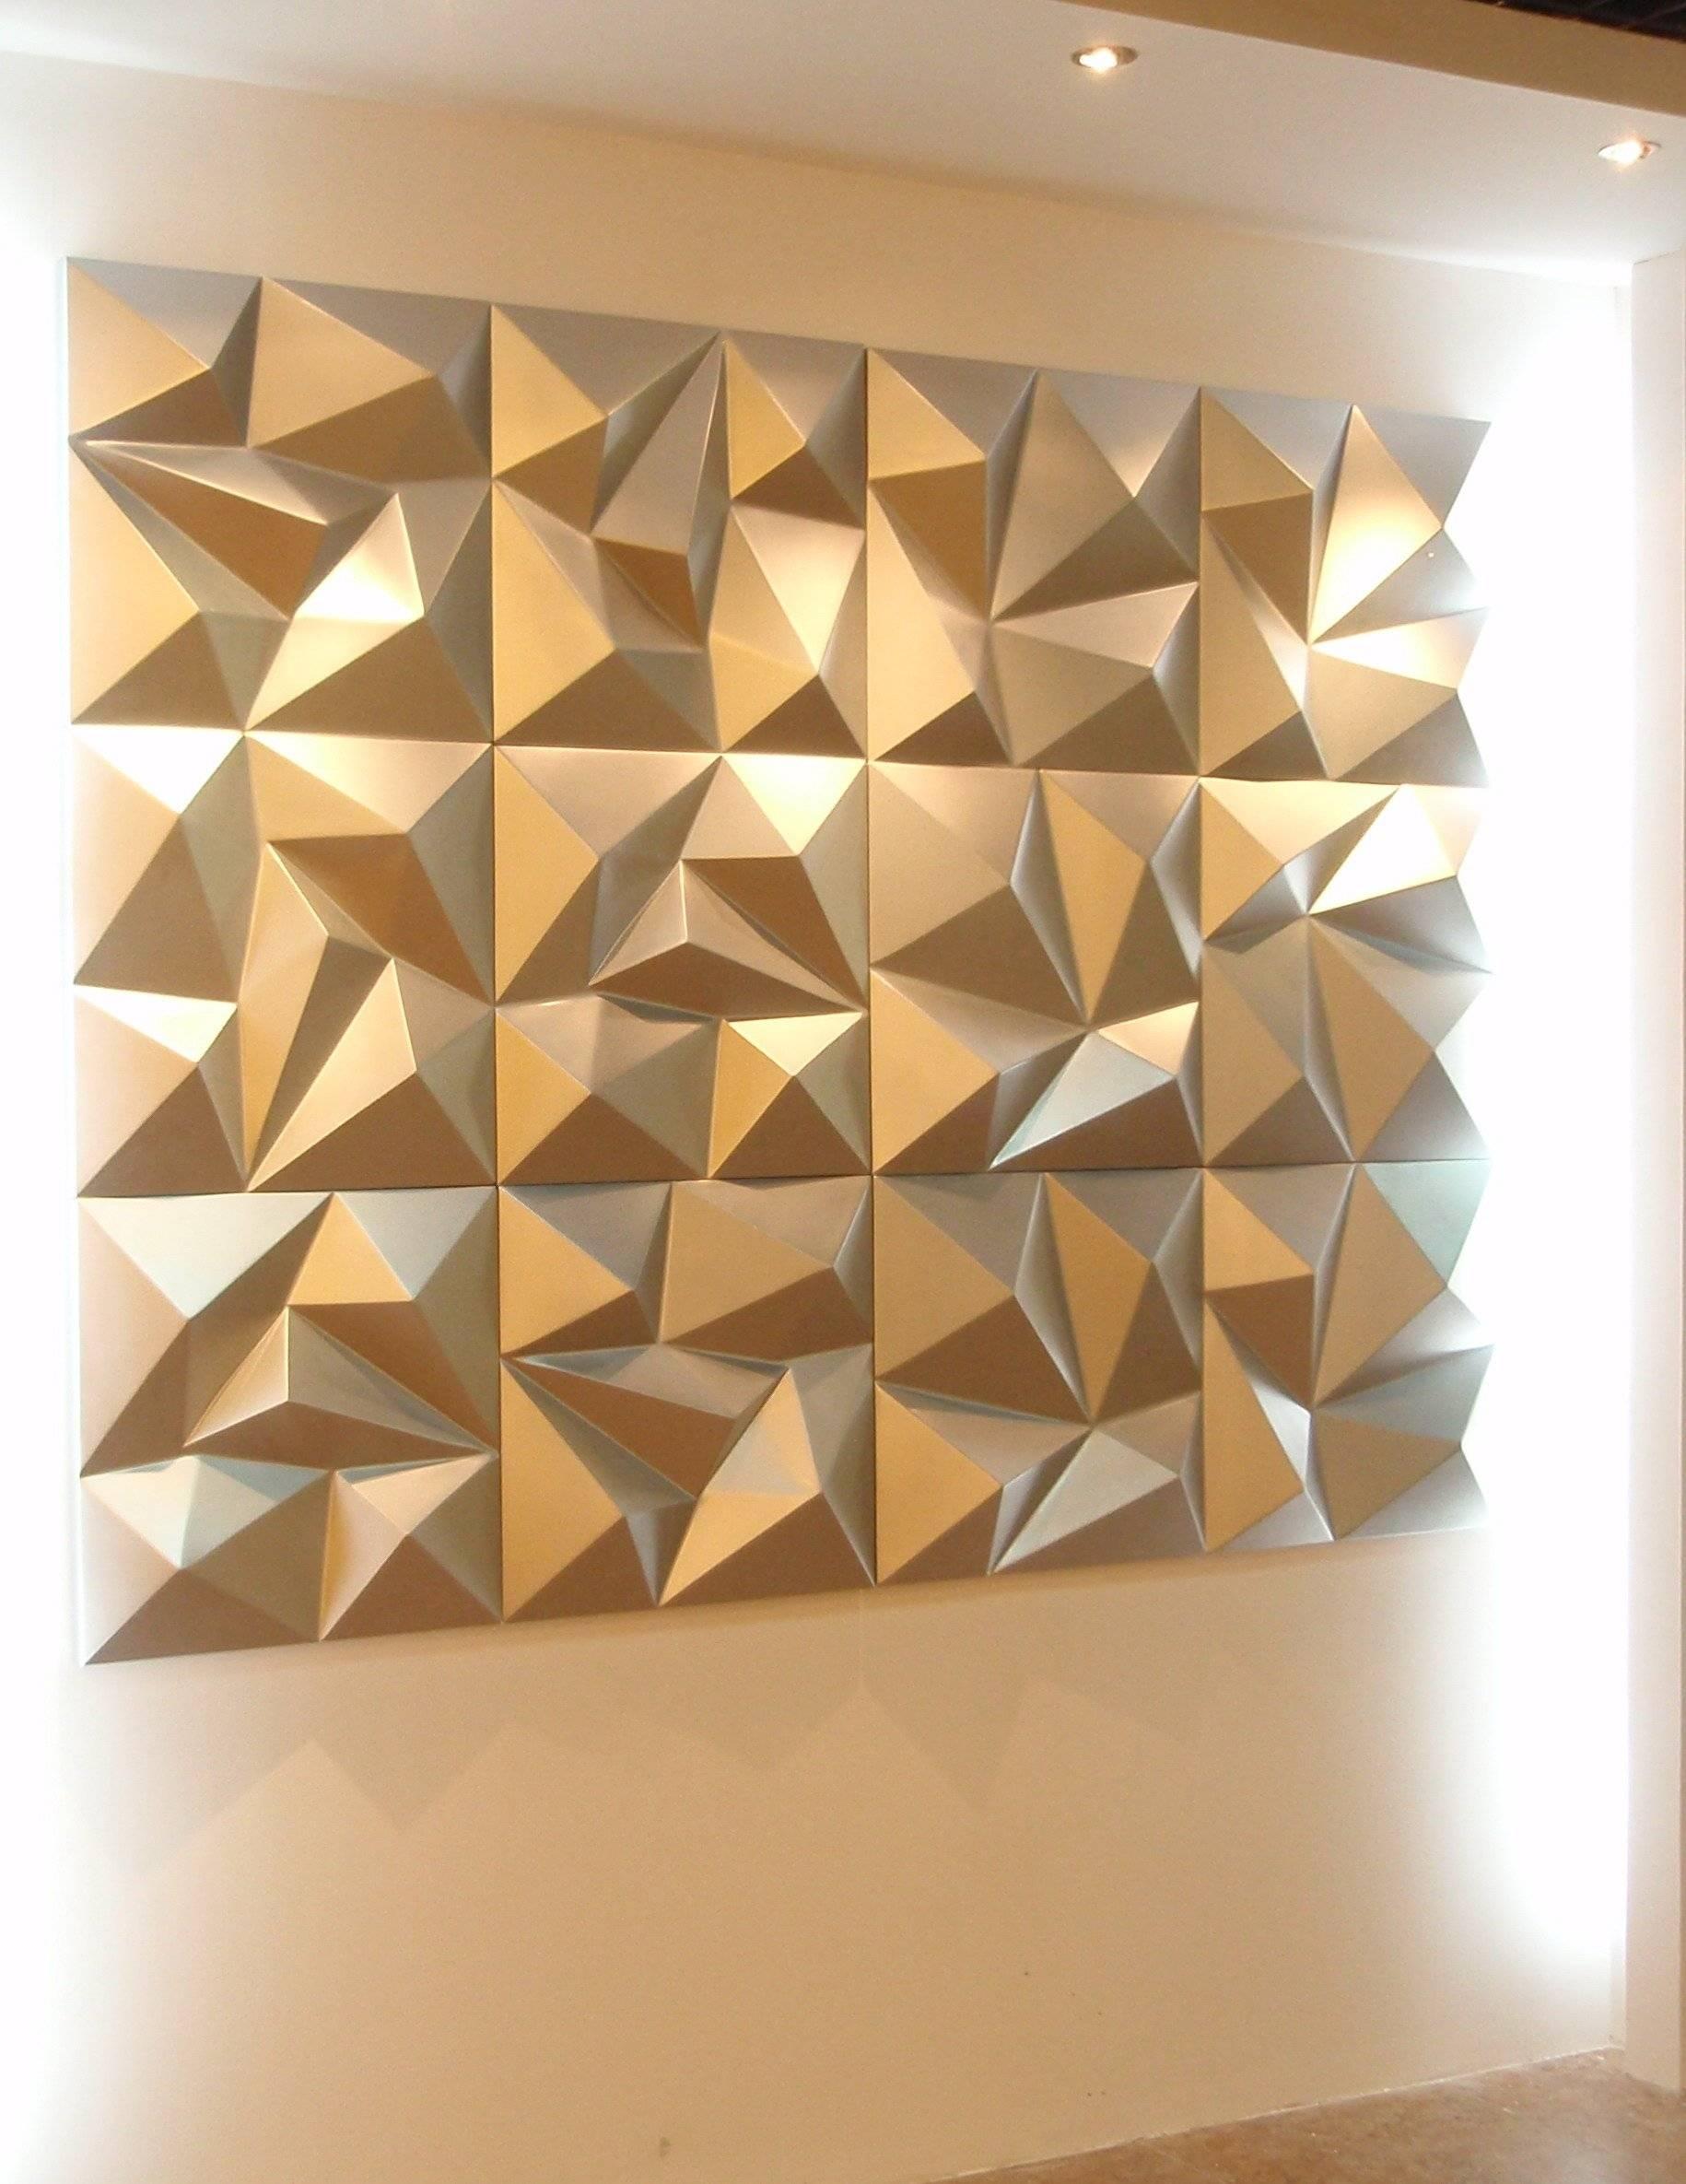 3D Wall Decor Panels – Home Design Throughout Most Current 3D Modern Wall Art (Gallery 10 of 20)